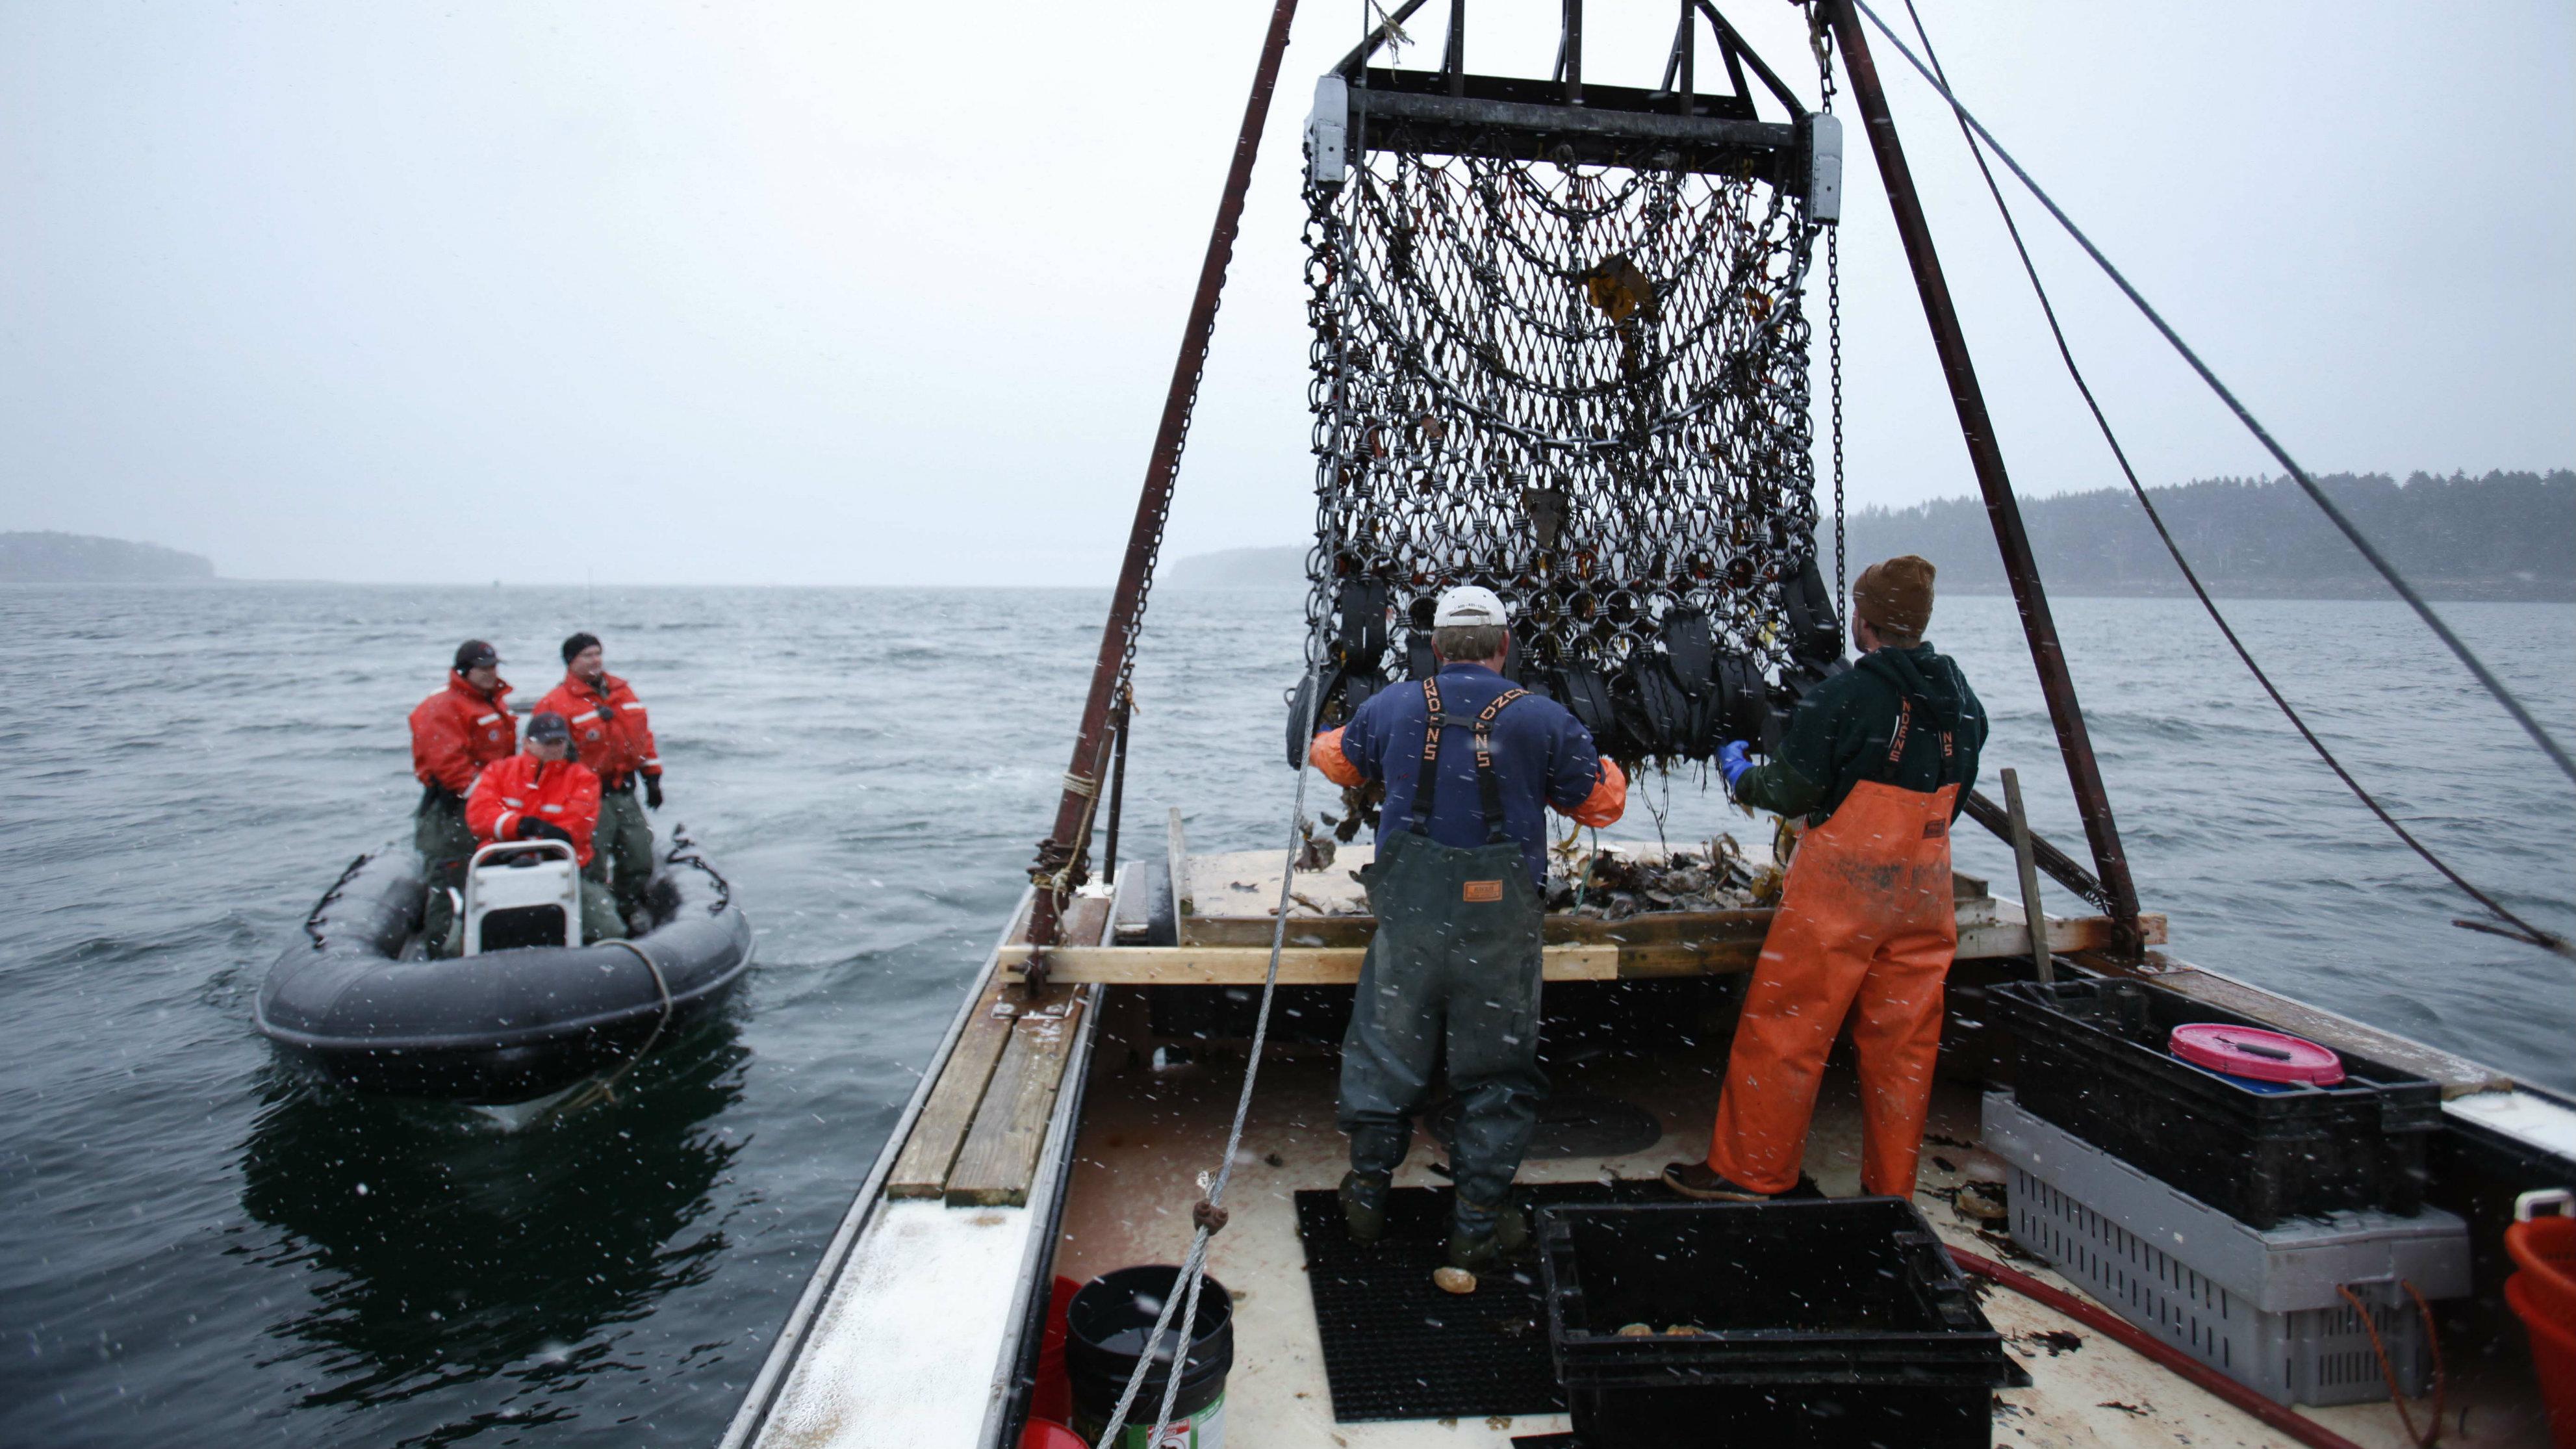 ocean technology revolution using boat humanity economic farmers start save boats donald